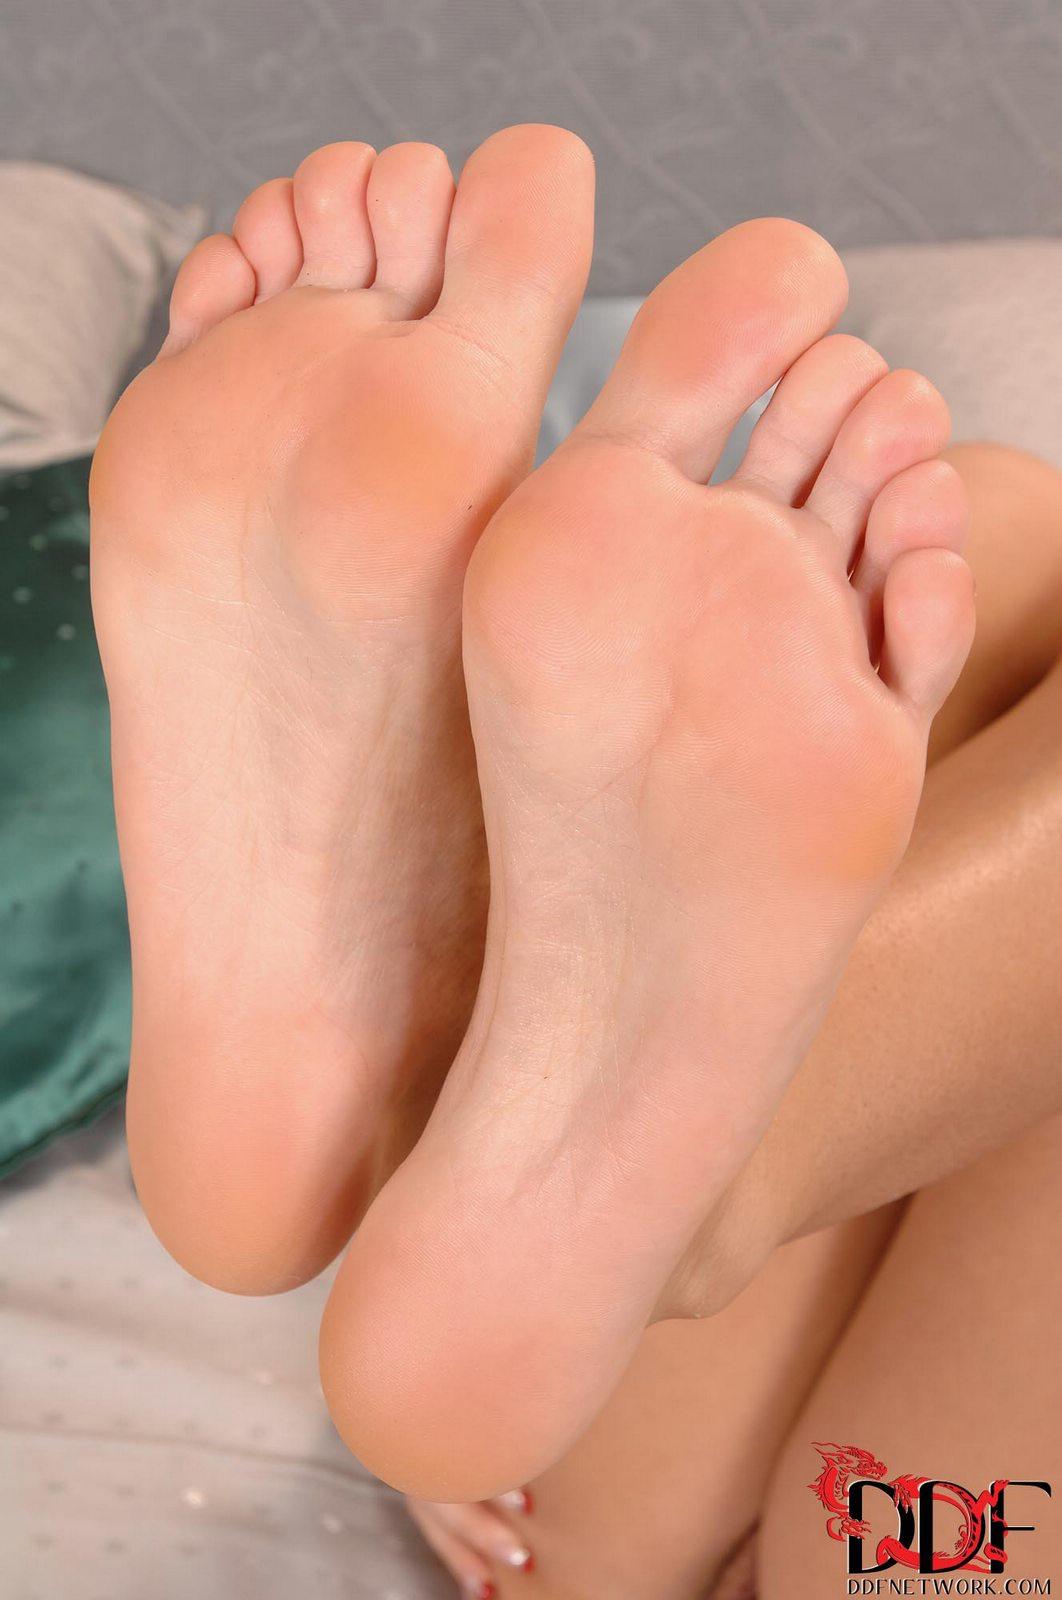 Zuzana Zeleznovova showing off her nice soles - My ...